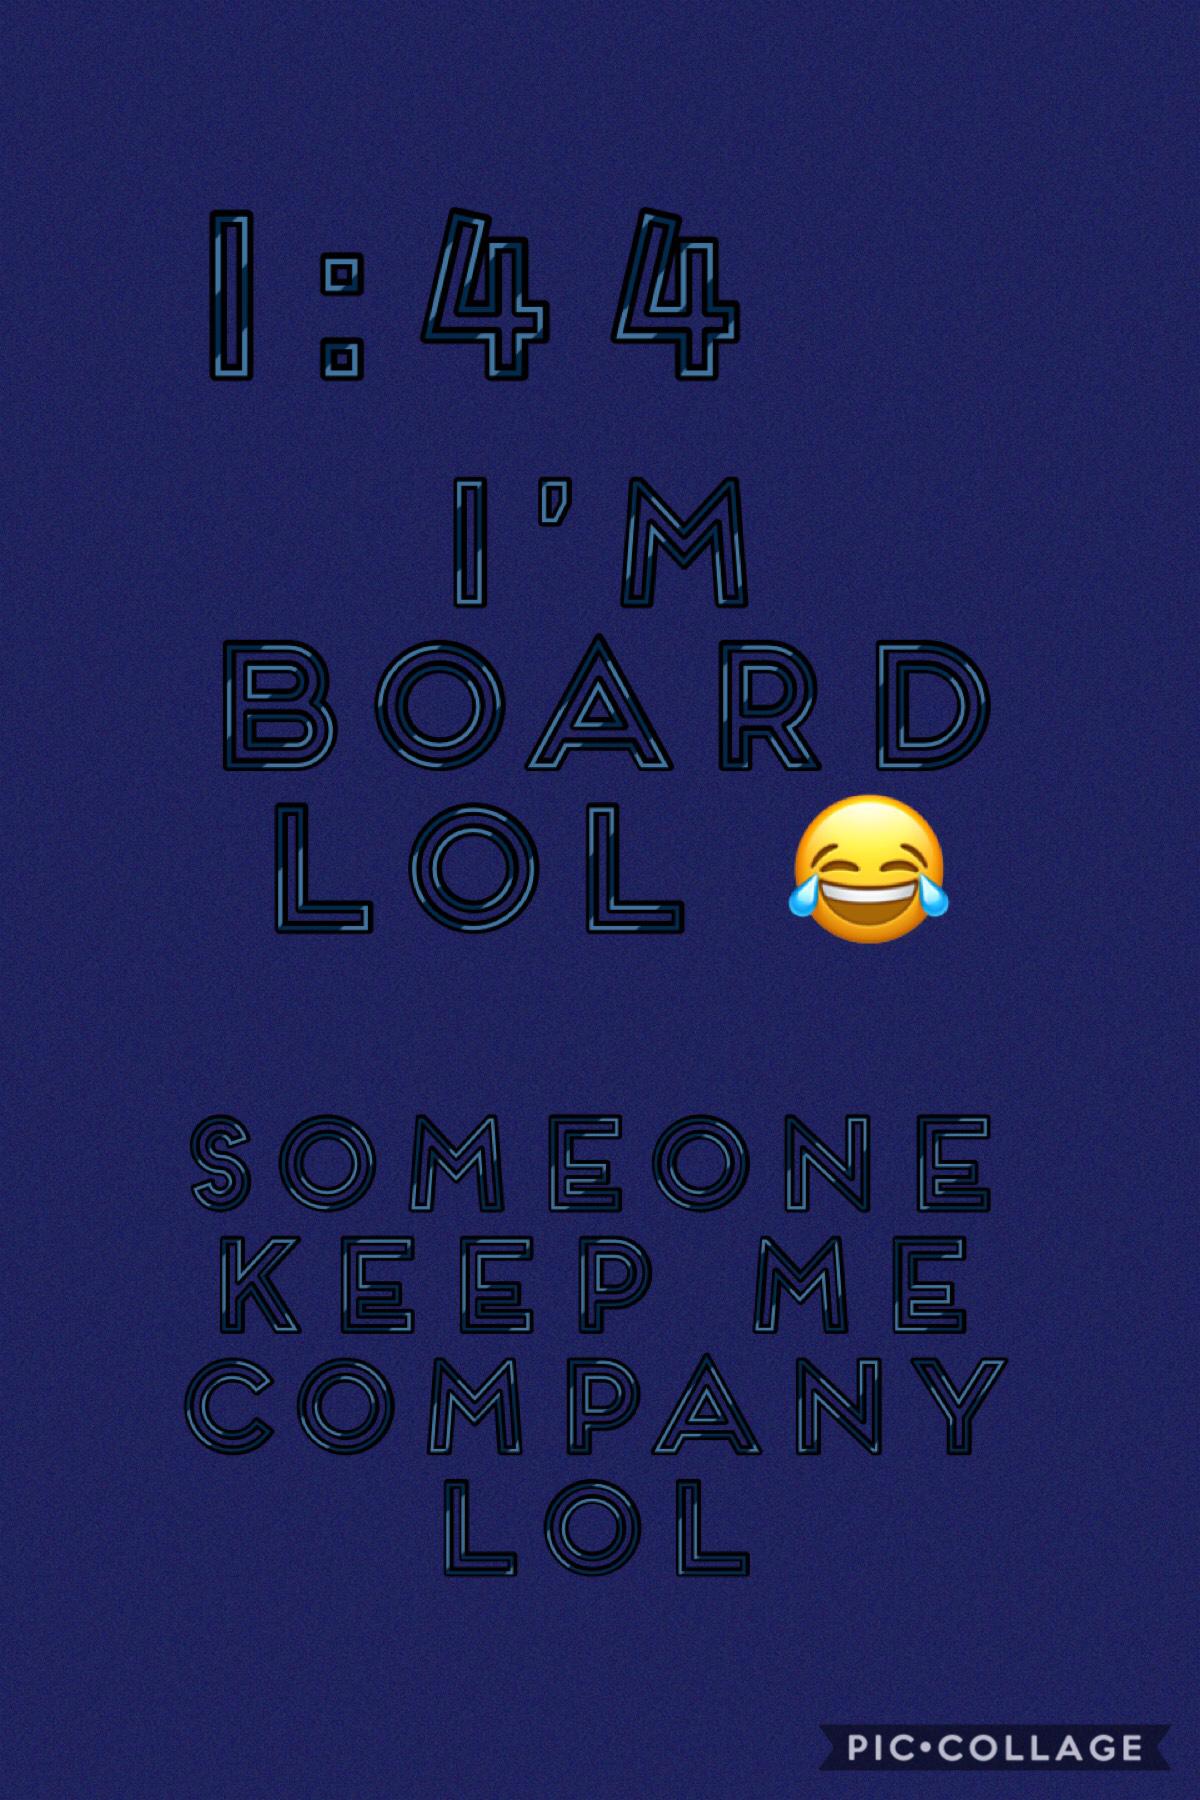 1:44 am I'm board